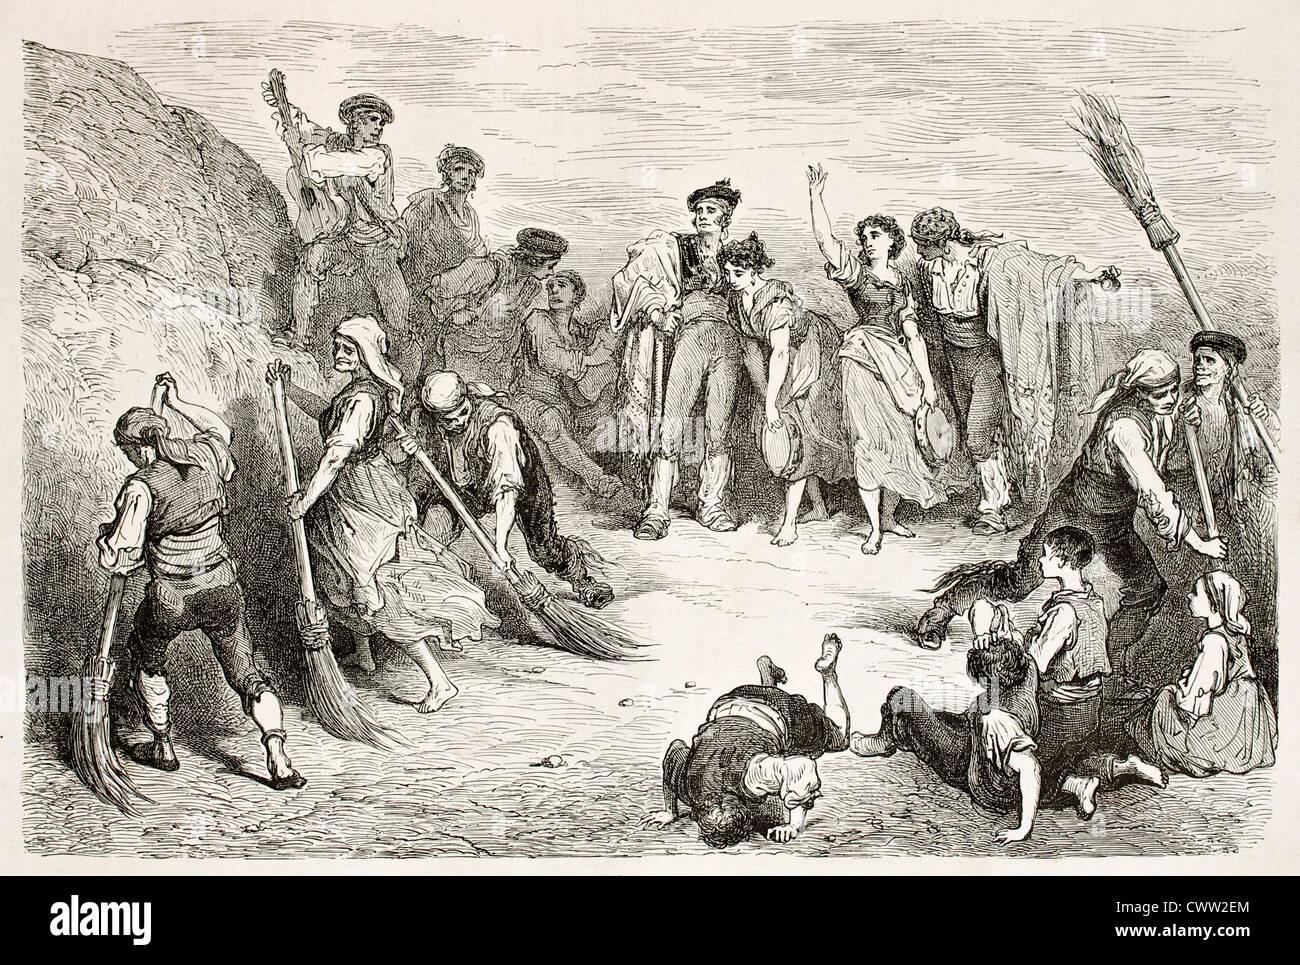 Seguidilla dancers old illustration. Created by Gustave Dore, published on Le Tour Du Monde, Paris, 1867 Stock Photo